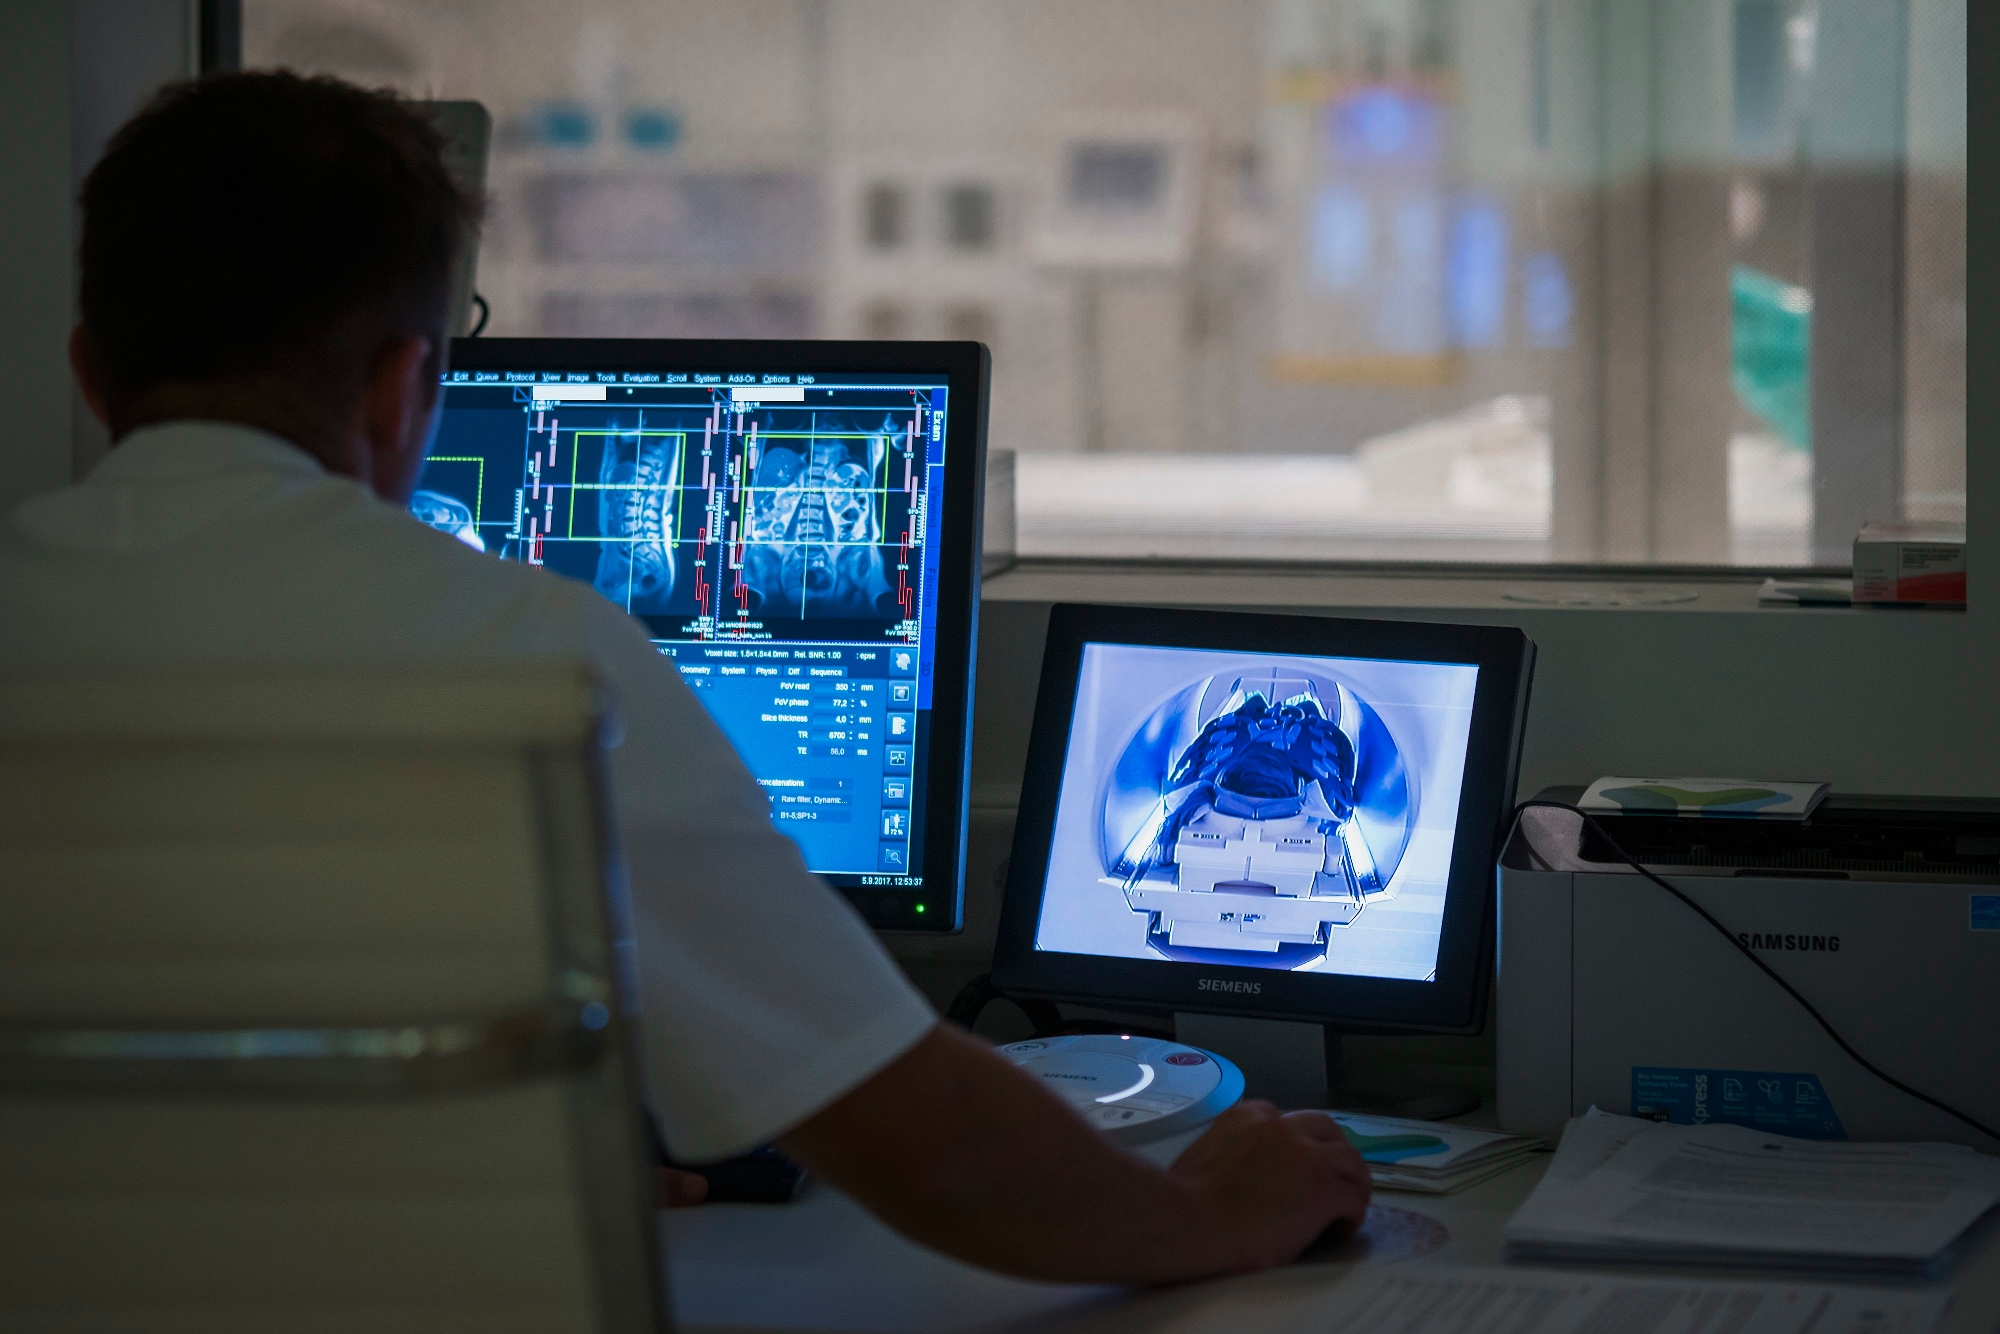 Poliklinika Radiochirurgia Zagreb